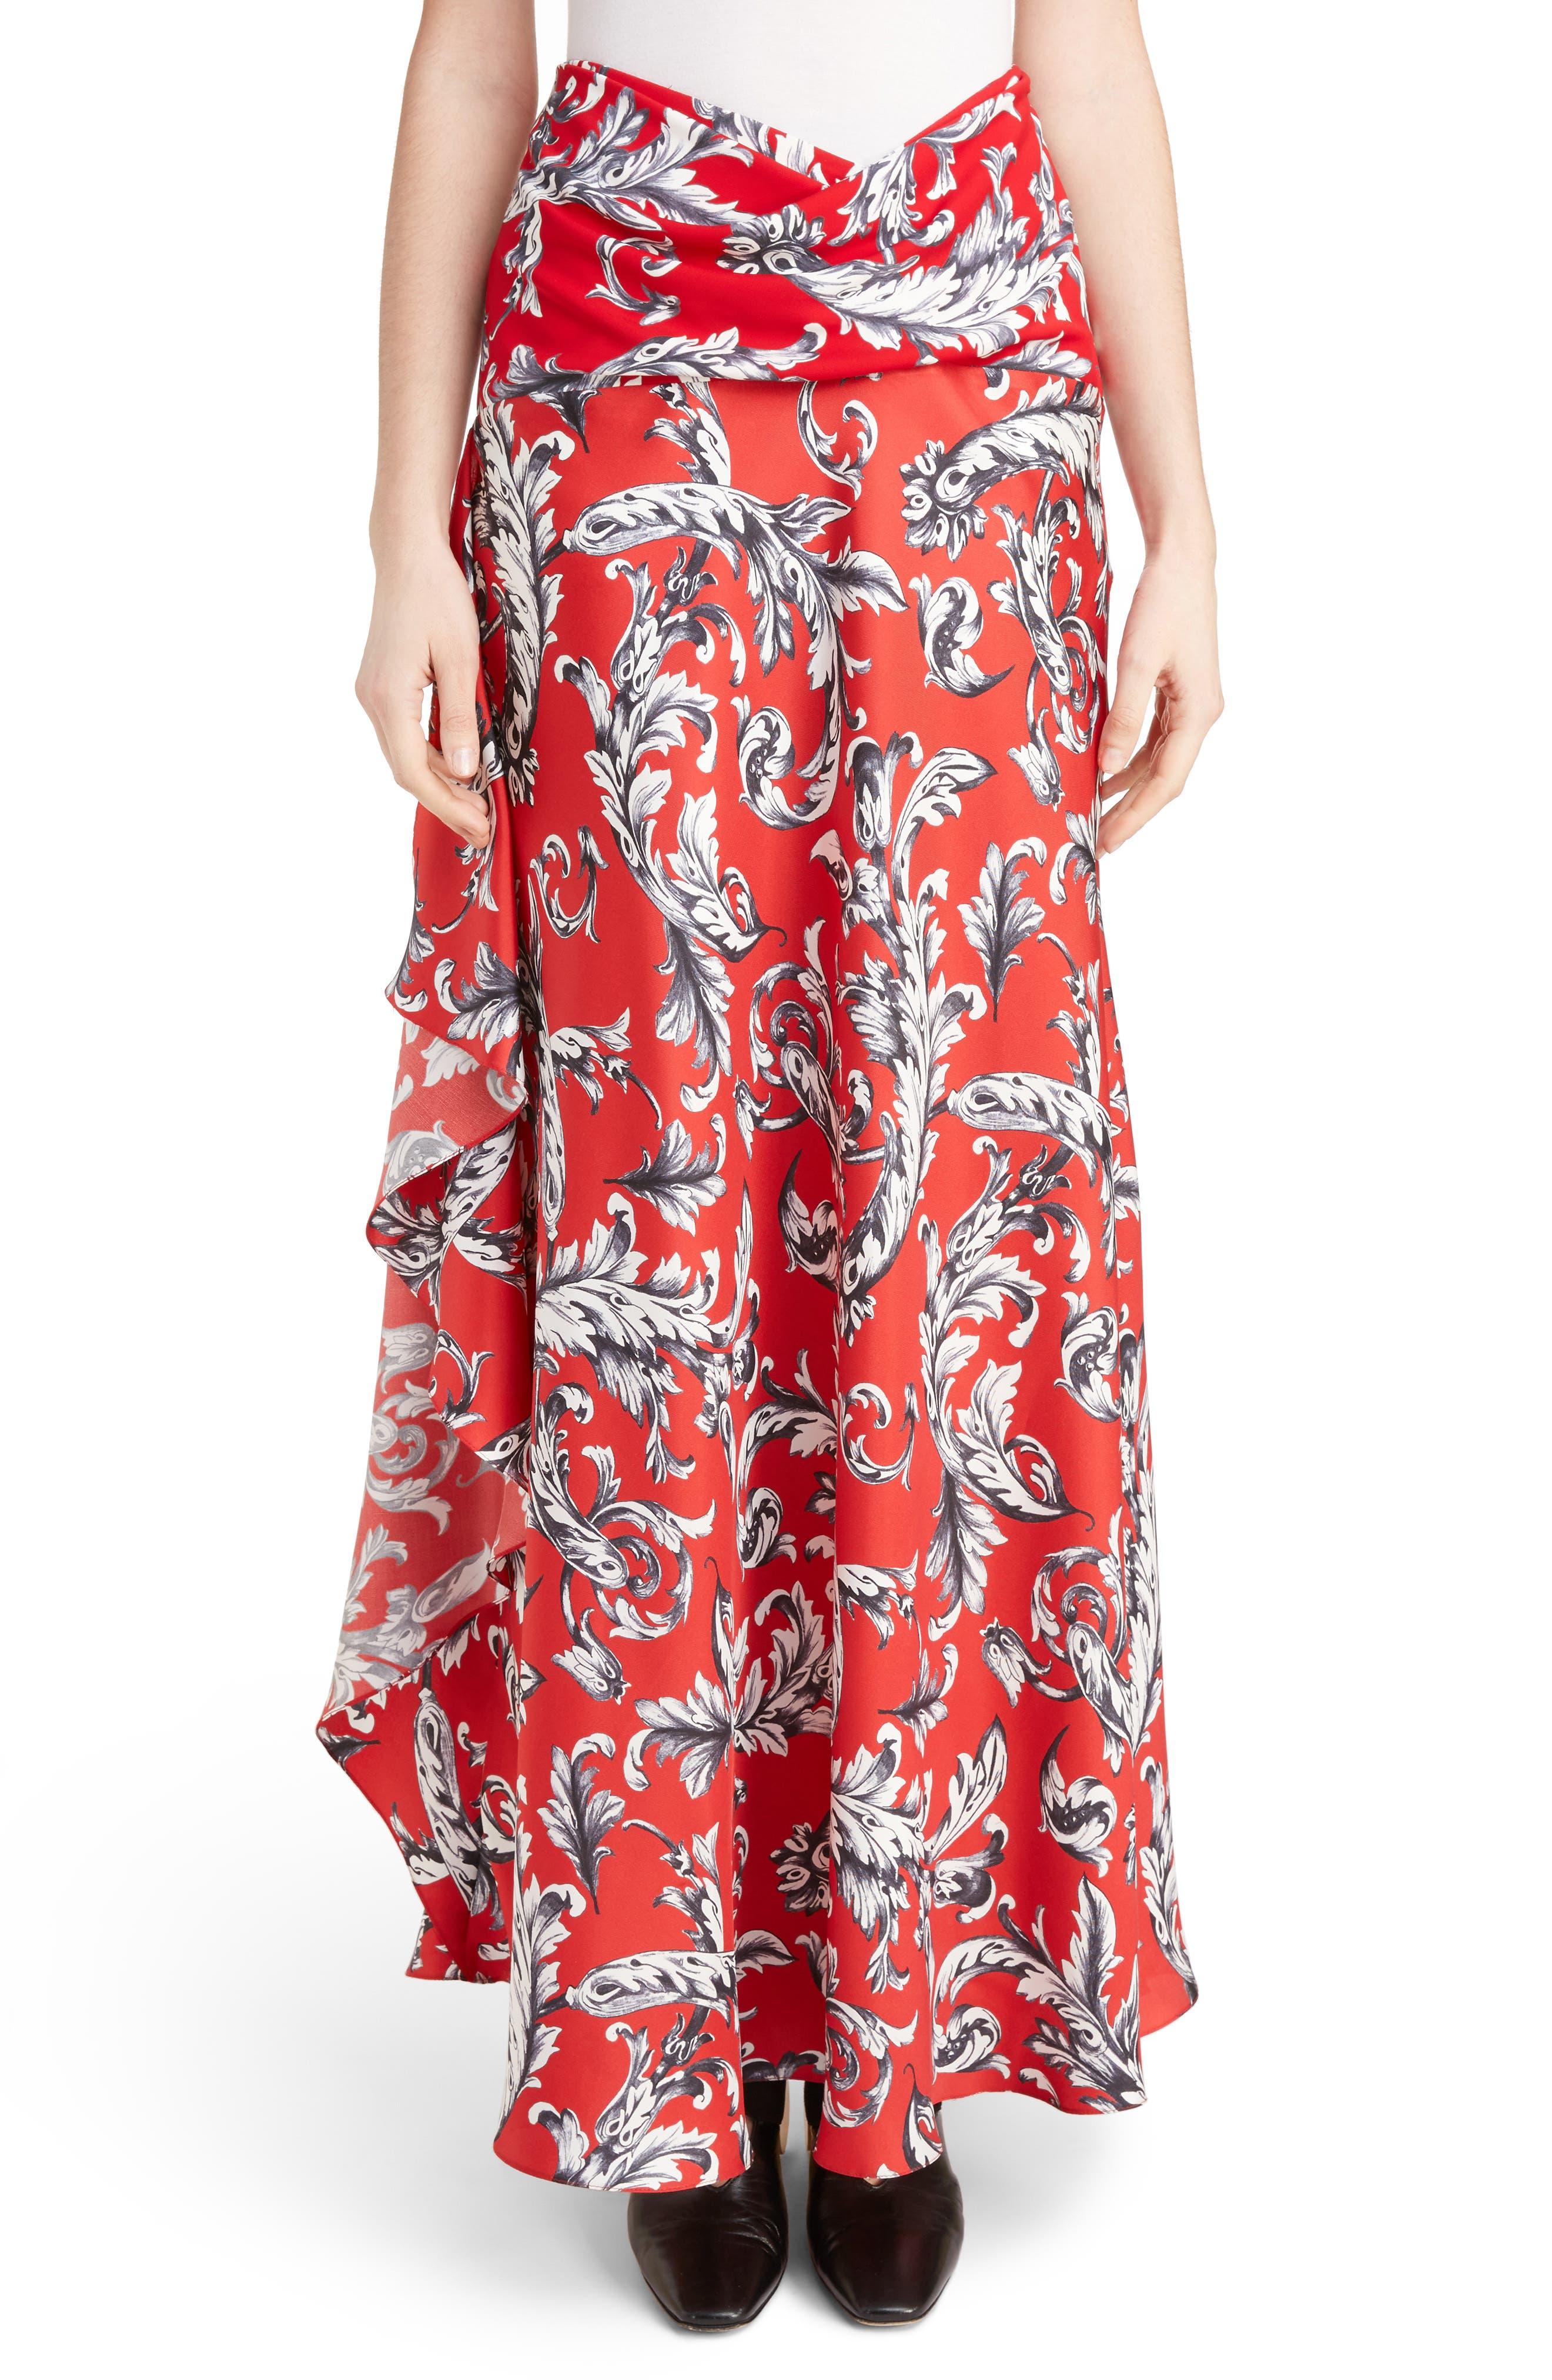 J.W.ANDERSON Filigree Print Asymmetrical Maxi Skirt